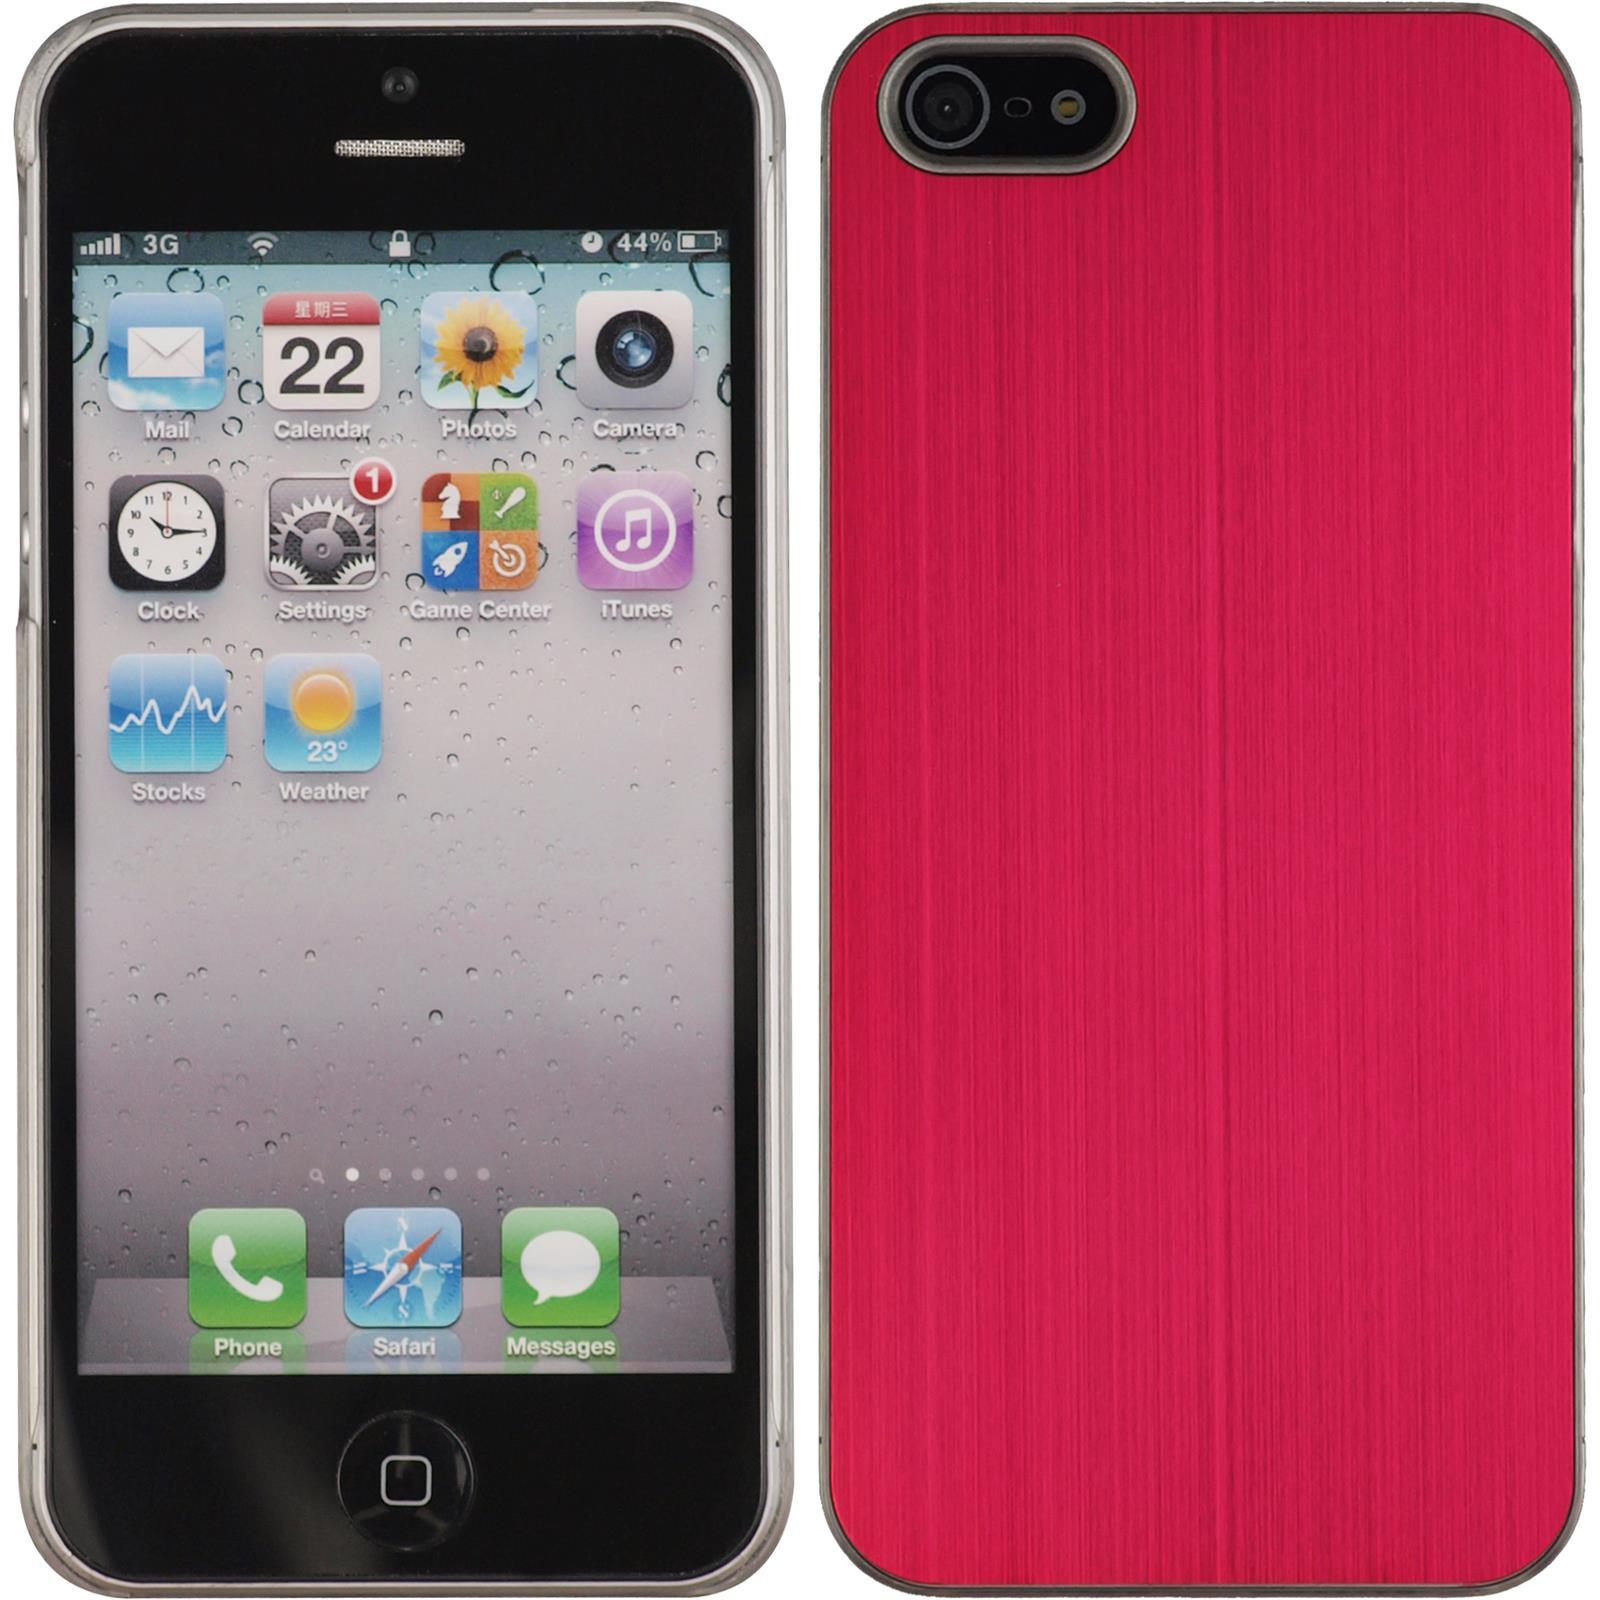 Coque-Rigide-Apple-iPhone-5-5s-SE-metallique-films-de-protection